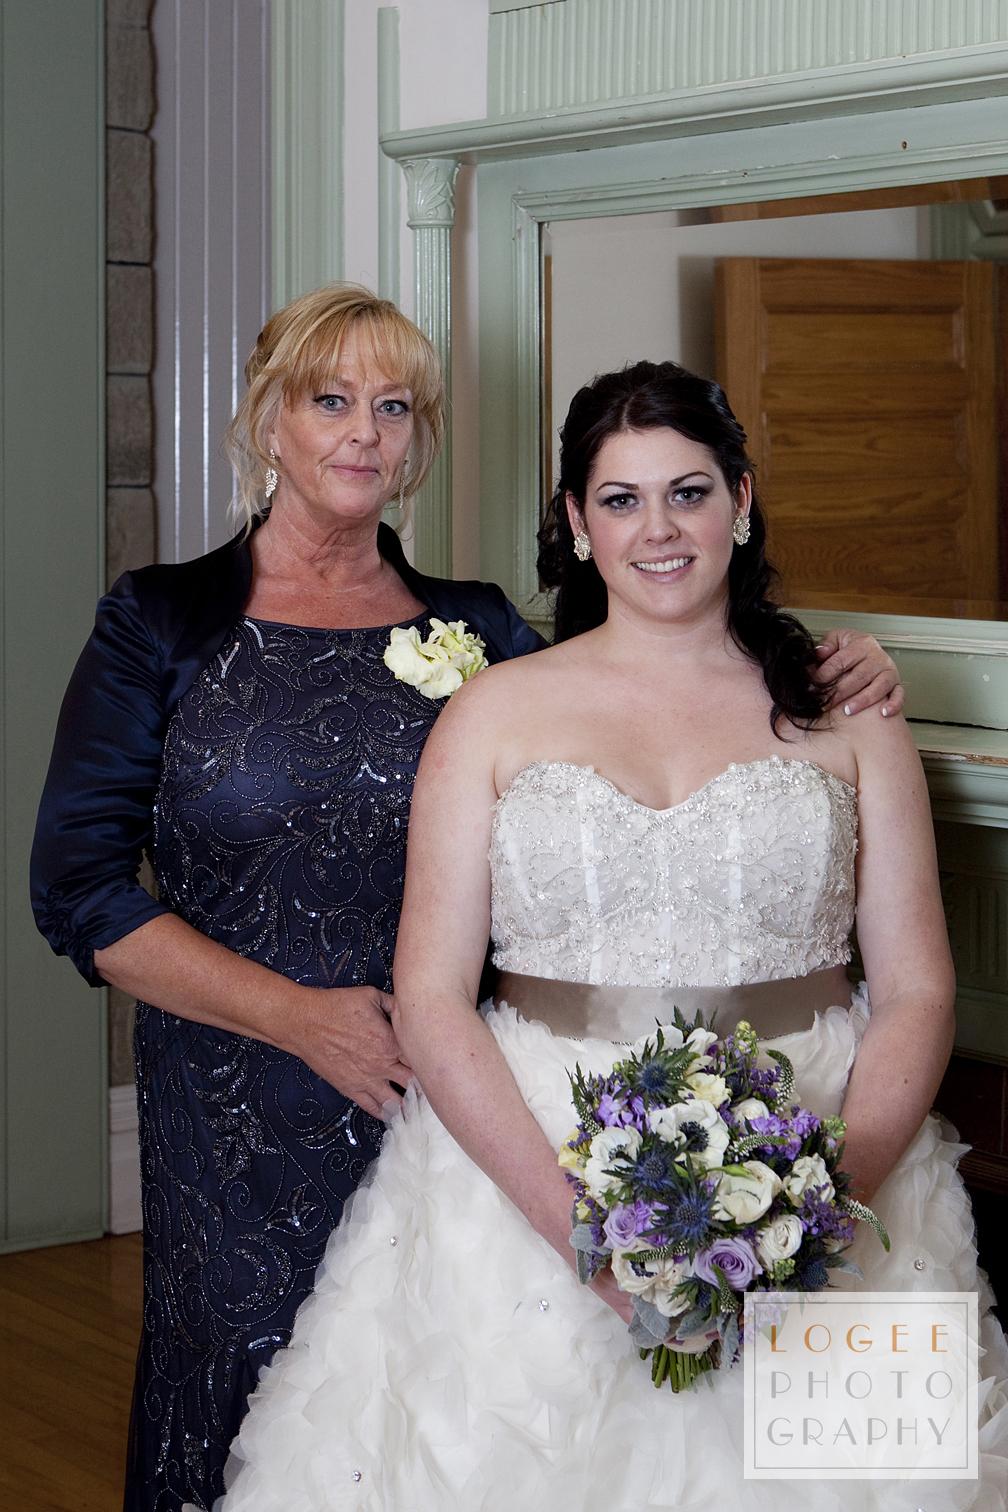 McIntosh-Burns Wedding - 7020Aw